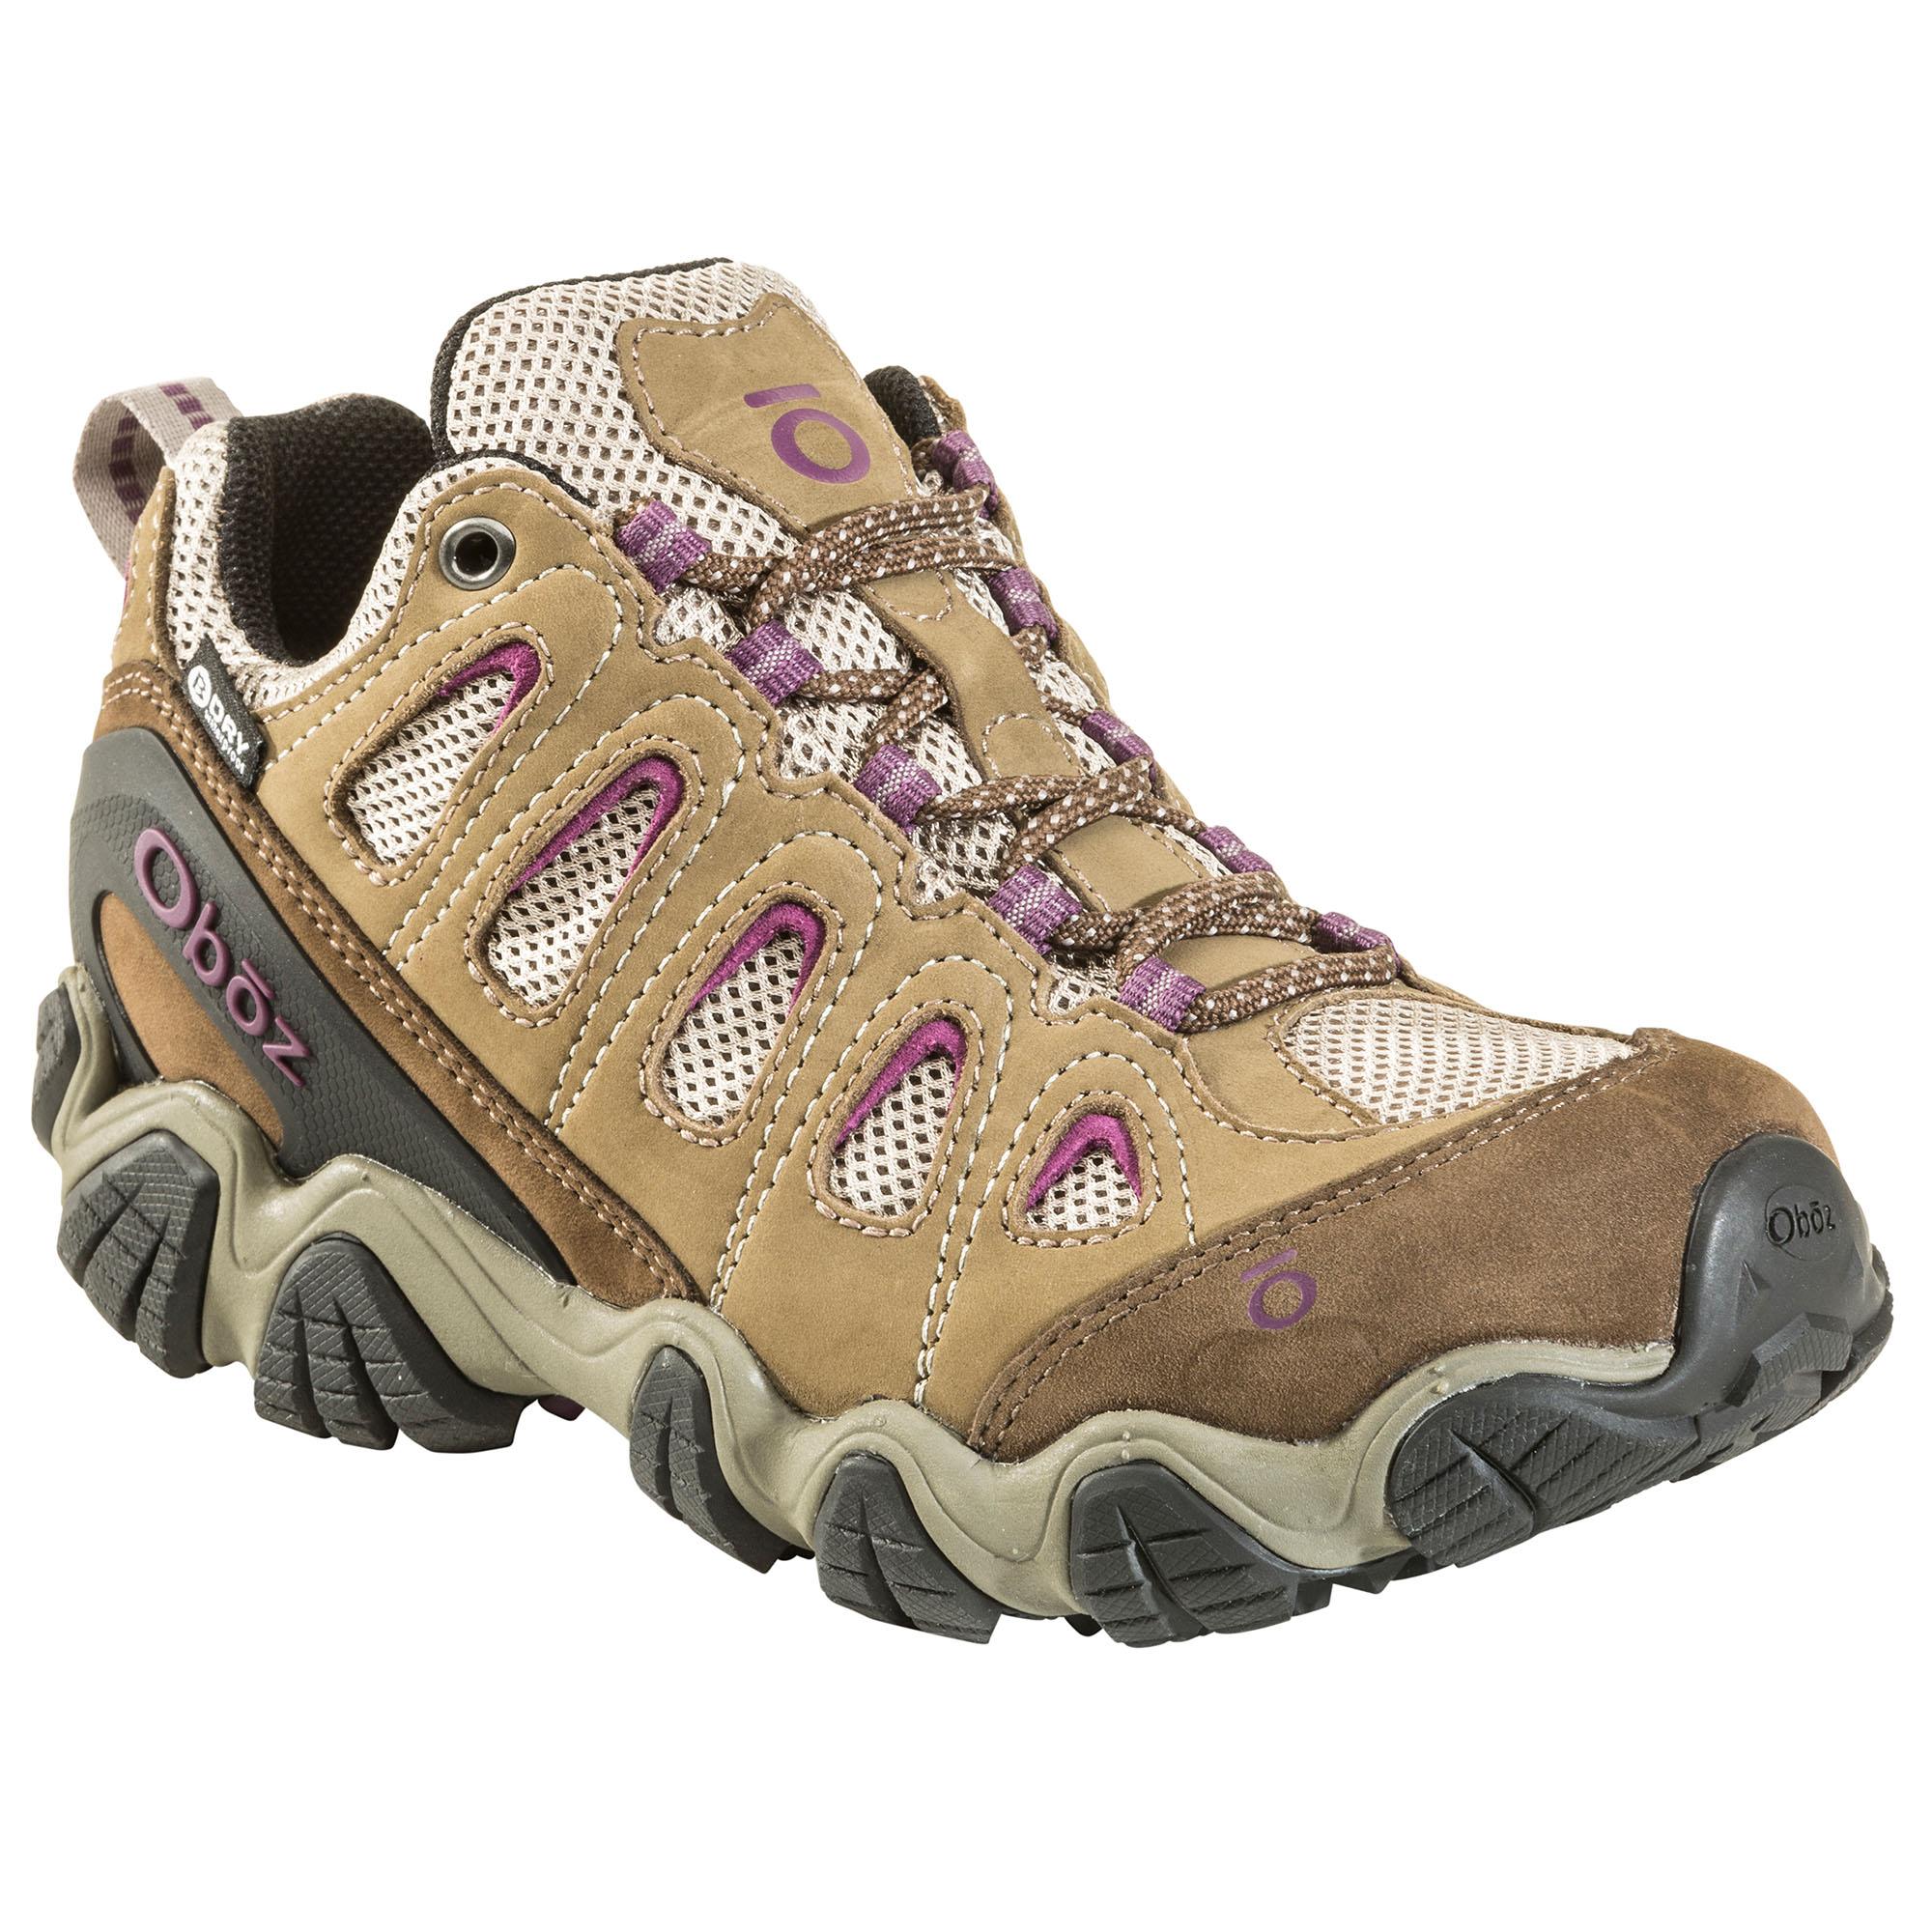 Sawtooth Ii Low Hiking Boots